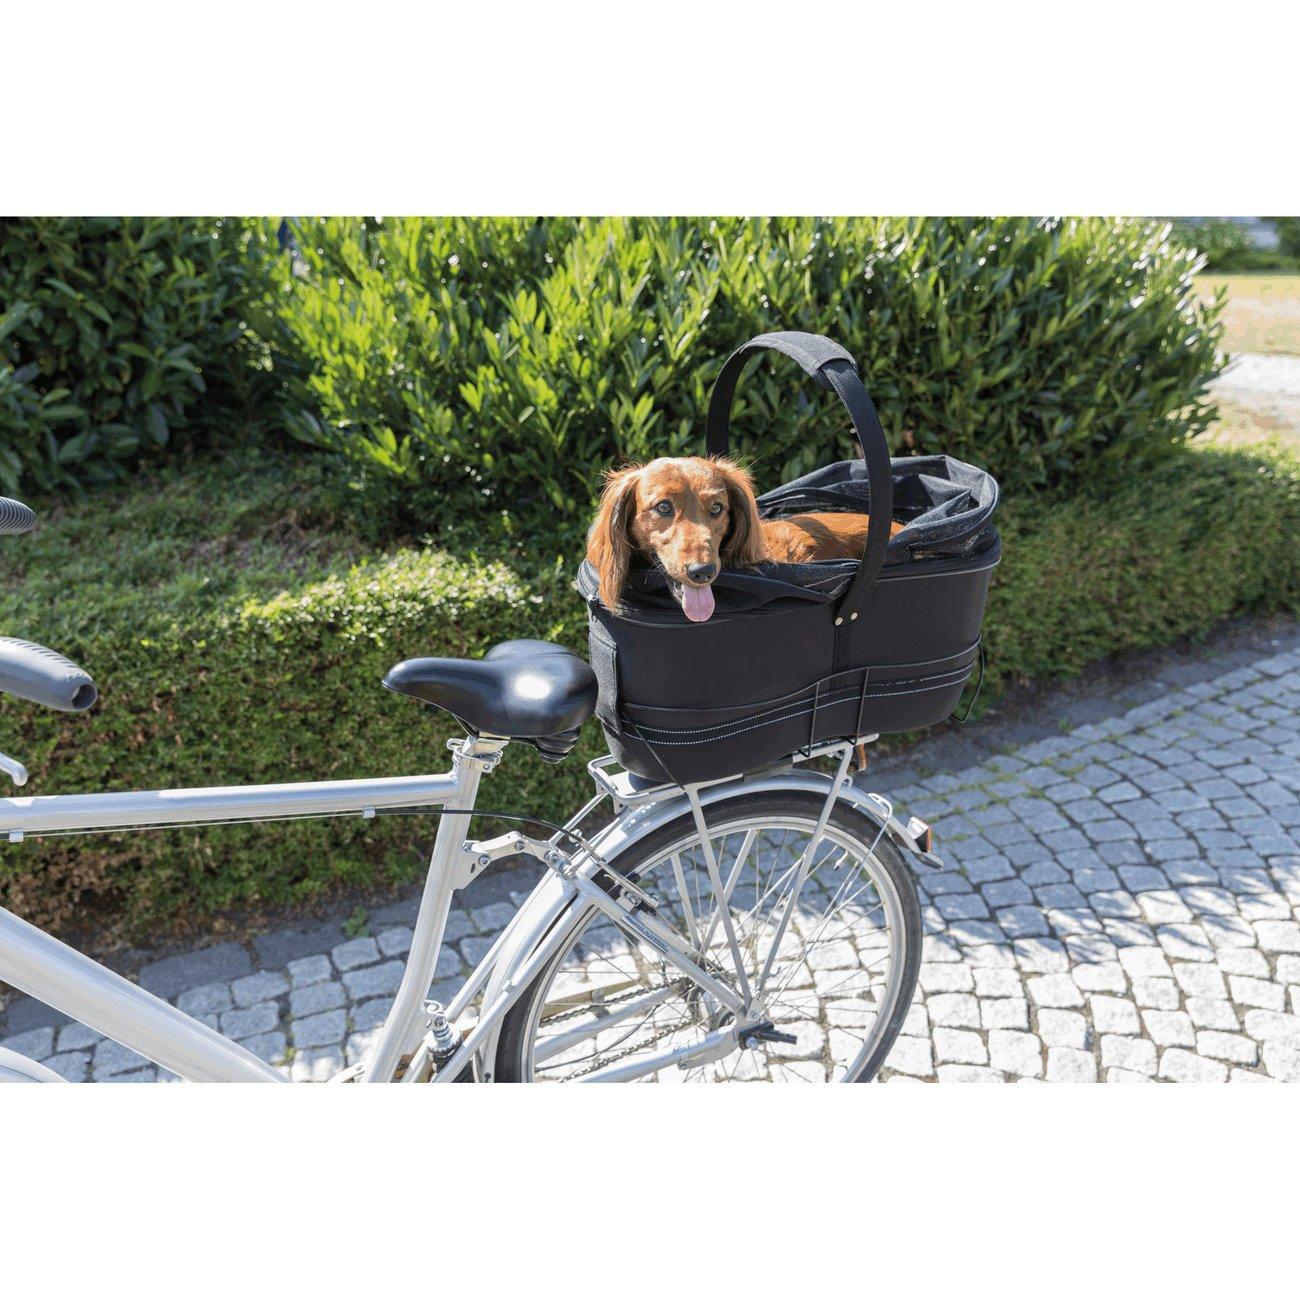 TRIXIE Hunde Fahrradkorb Long für breite Gepäckträger Preview Image